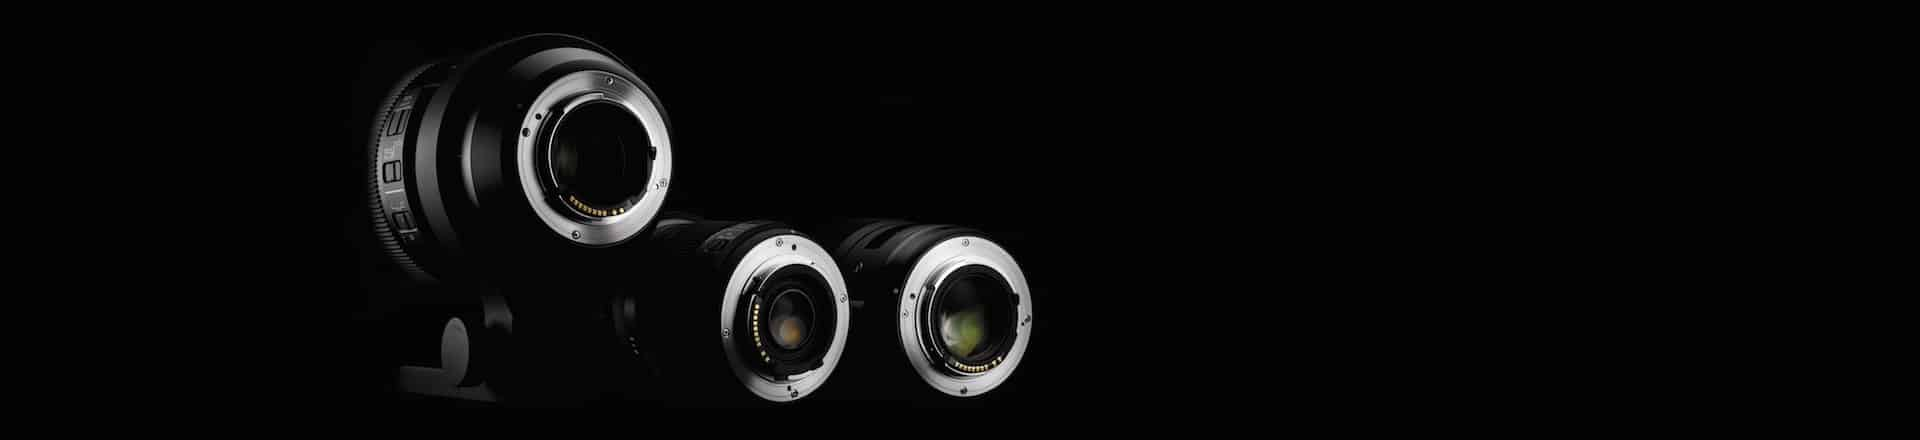 Objektive Sigma Deutschland Gmbh Nikon Af Micro Nikkor 60mam F 28d Lens